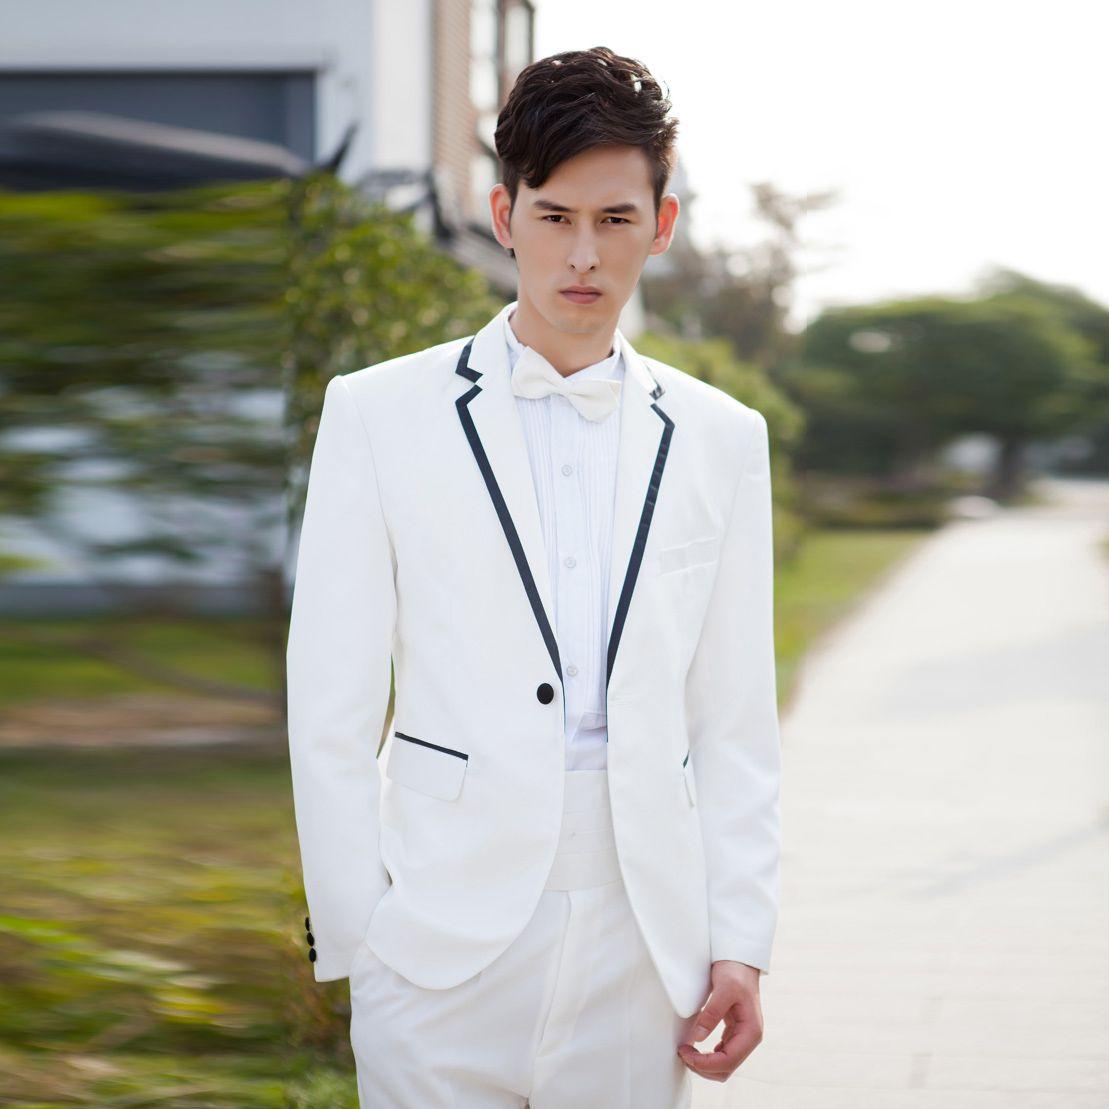 Imagen relacionada damatlık pinterest suit fashion blazer